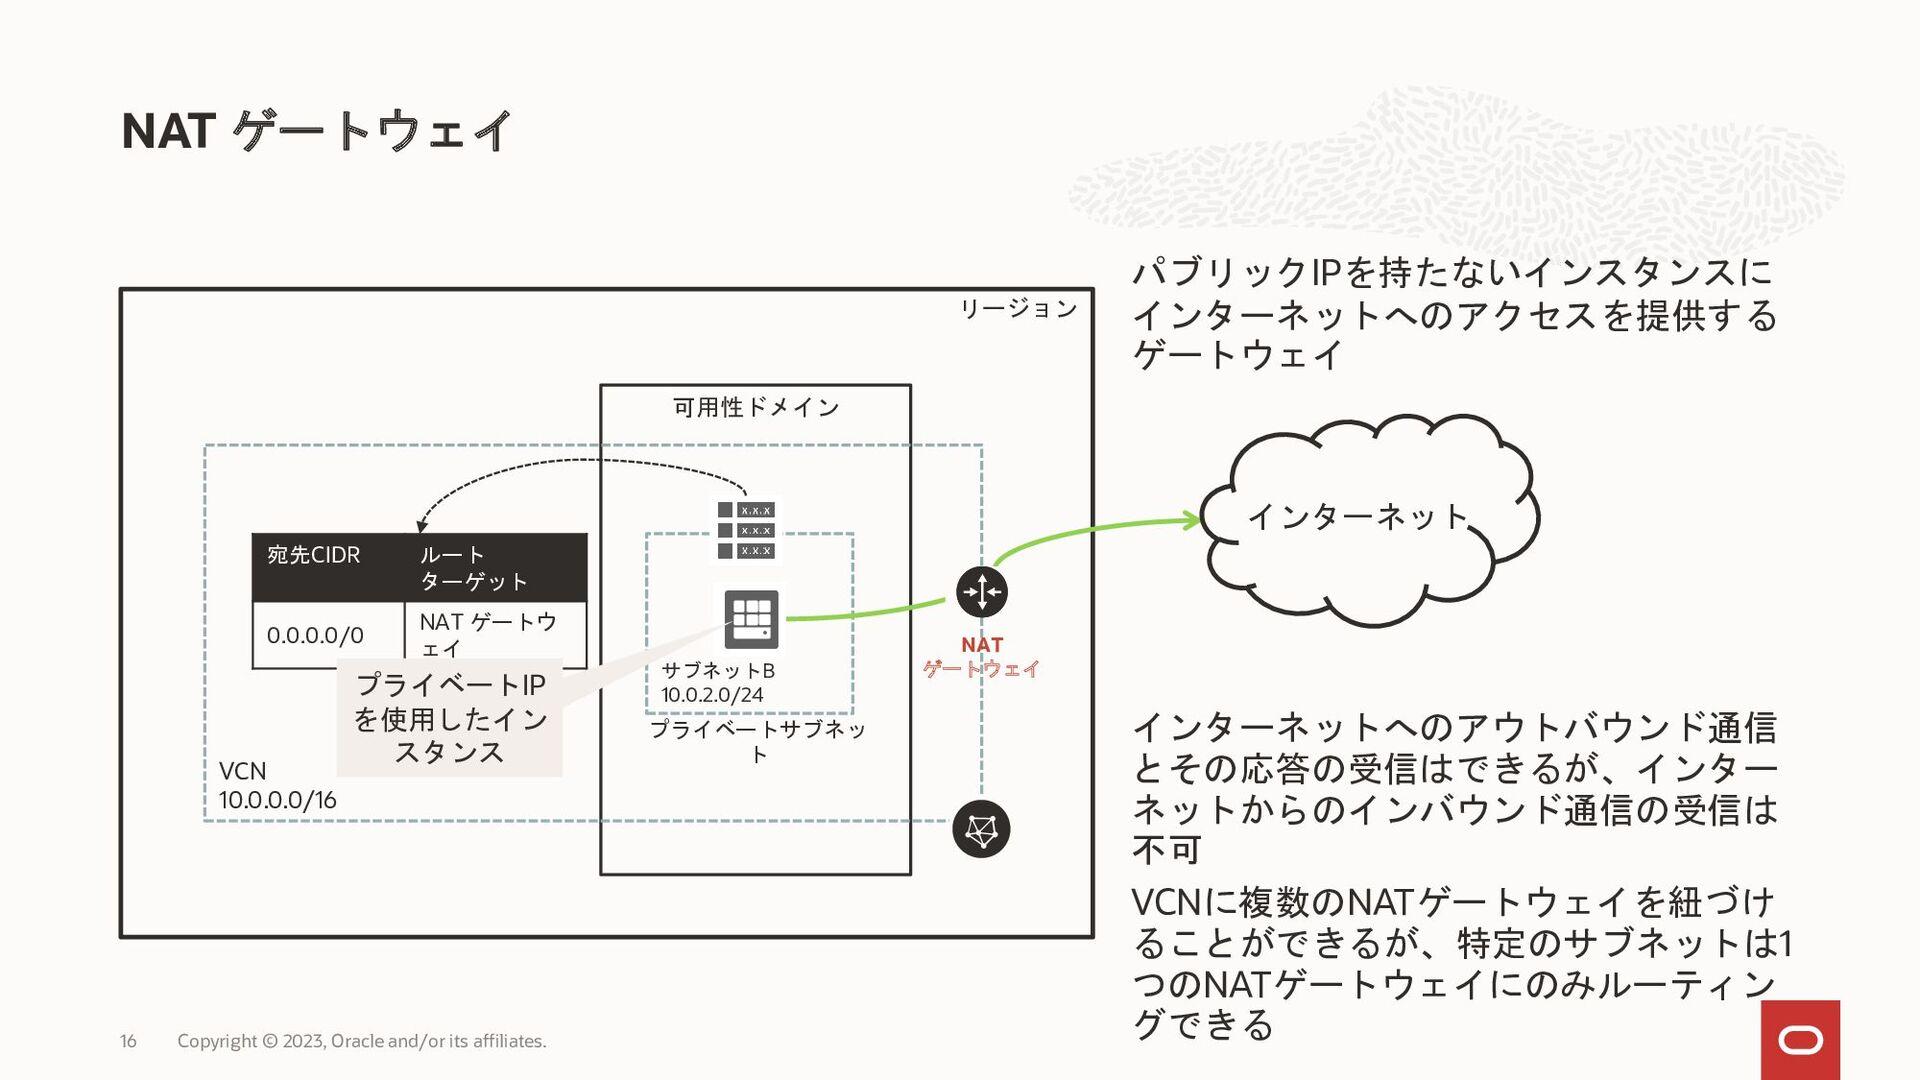 VCN 10.0.0.0/16 B 10.0.2.0/24 VCN 翻 • • CIDR • ...